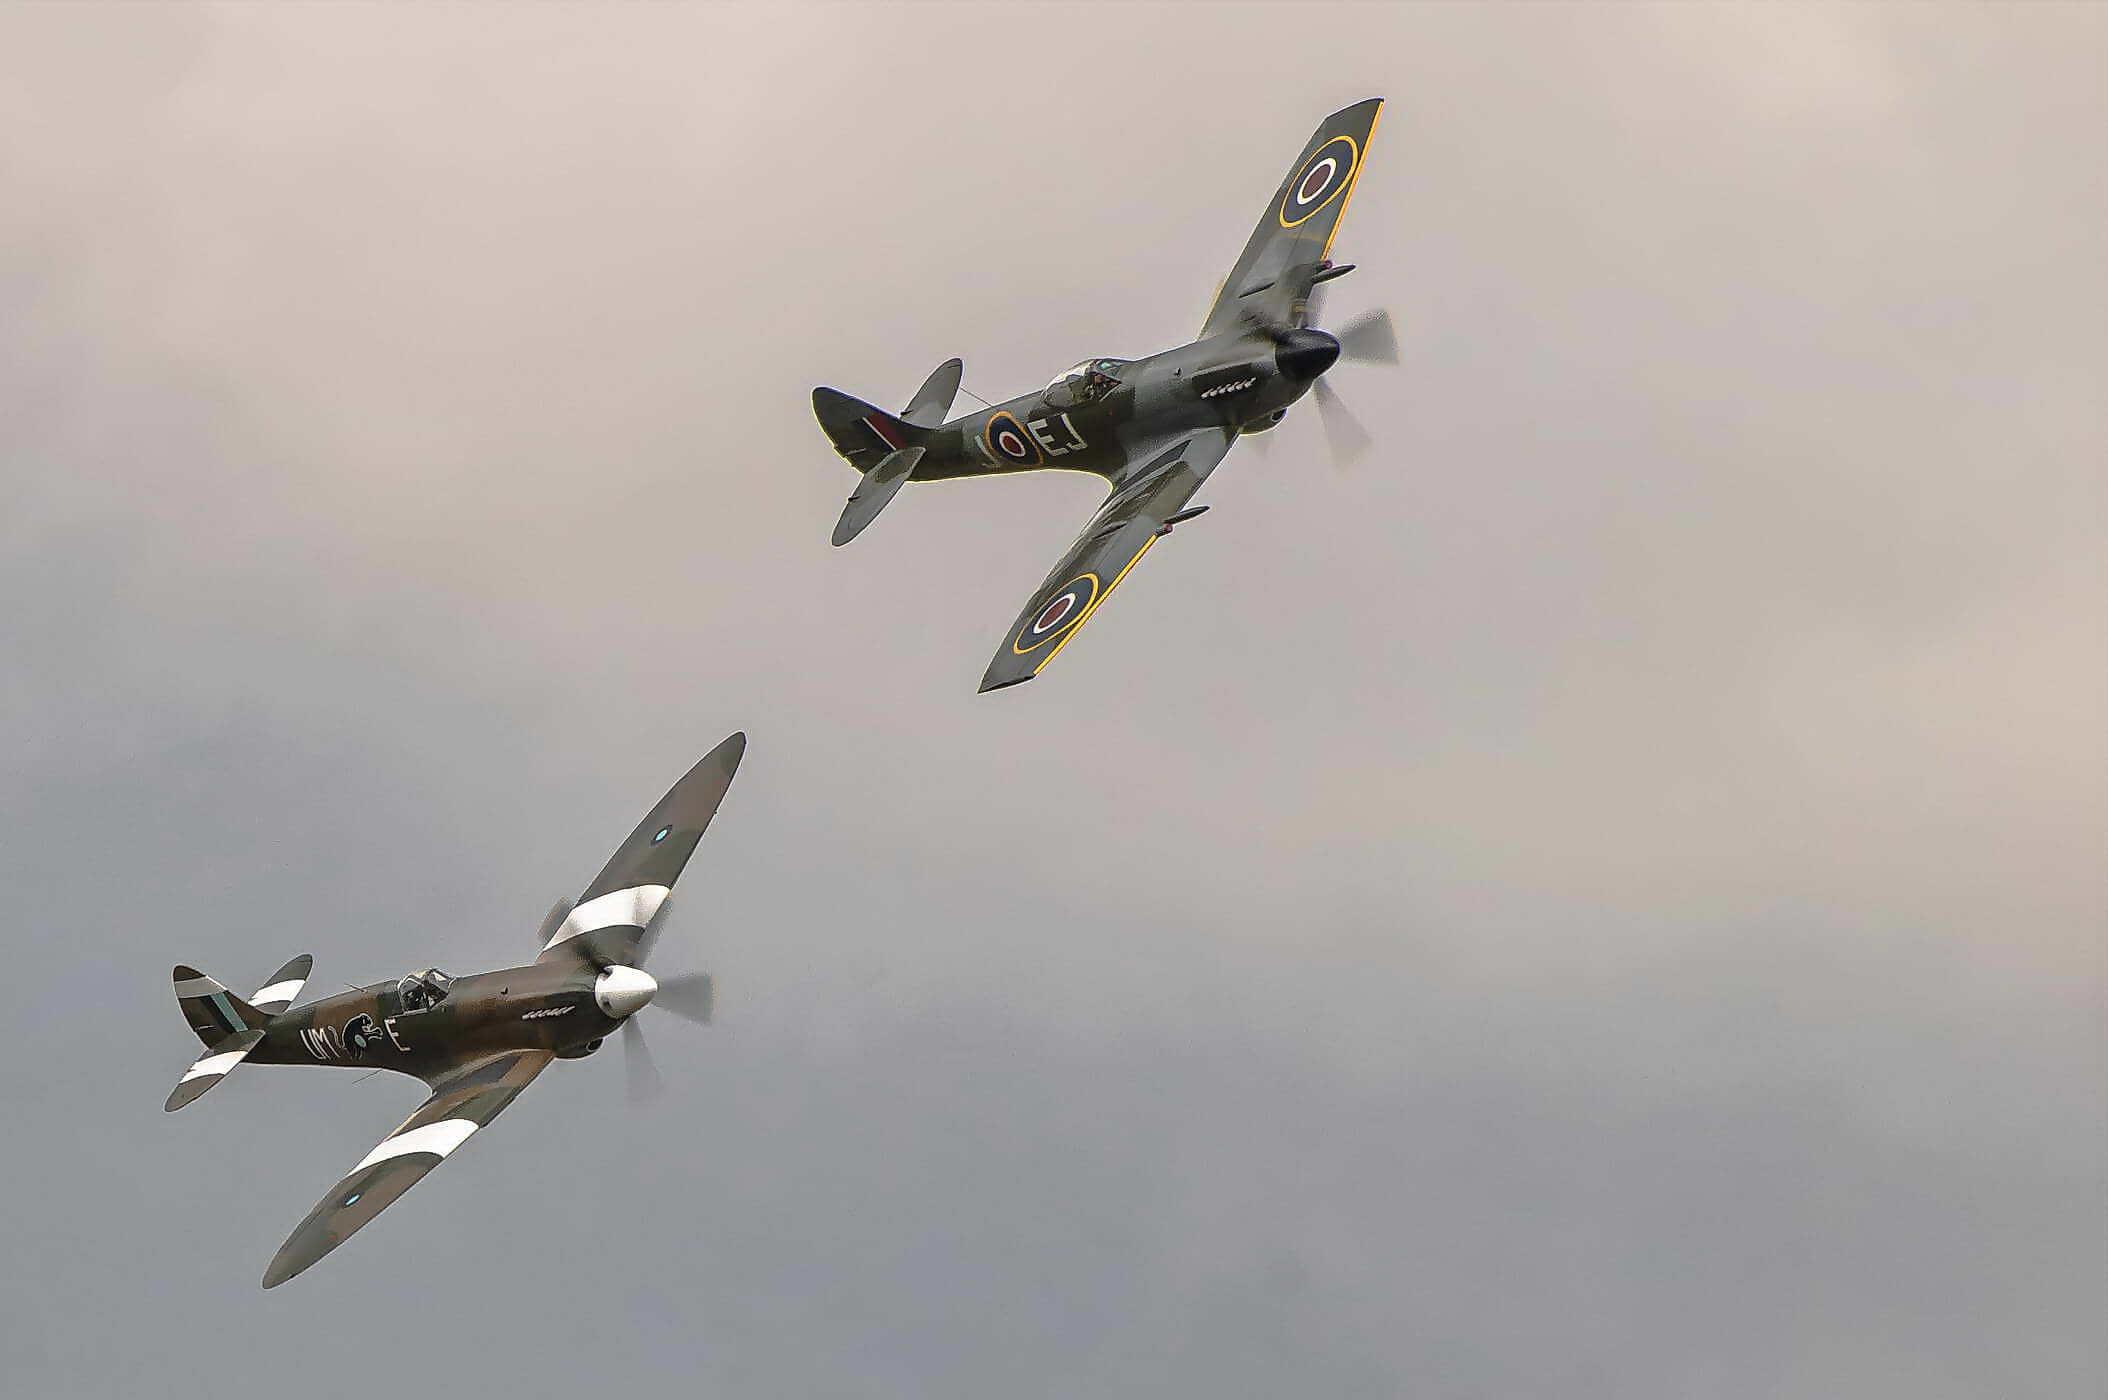 Supermarine Spitfire PR XIX PS890 & Spitfire MK XIV MV268